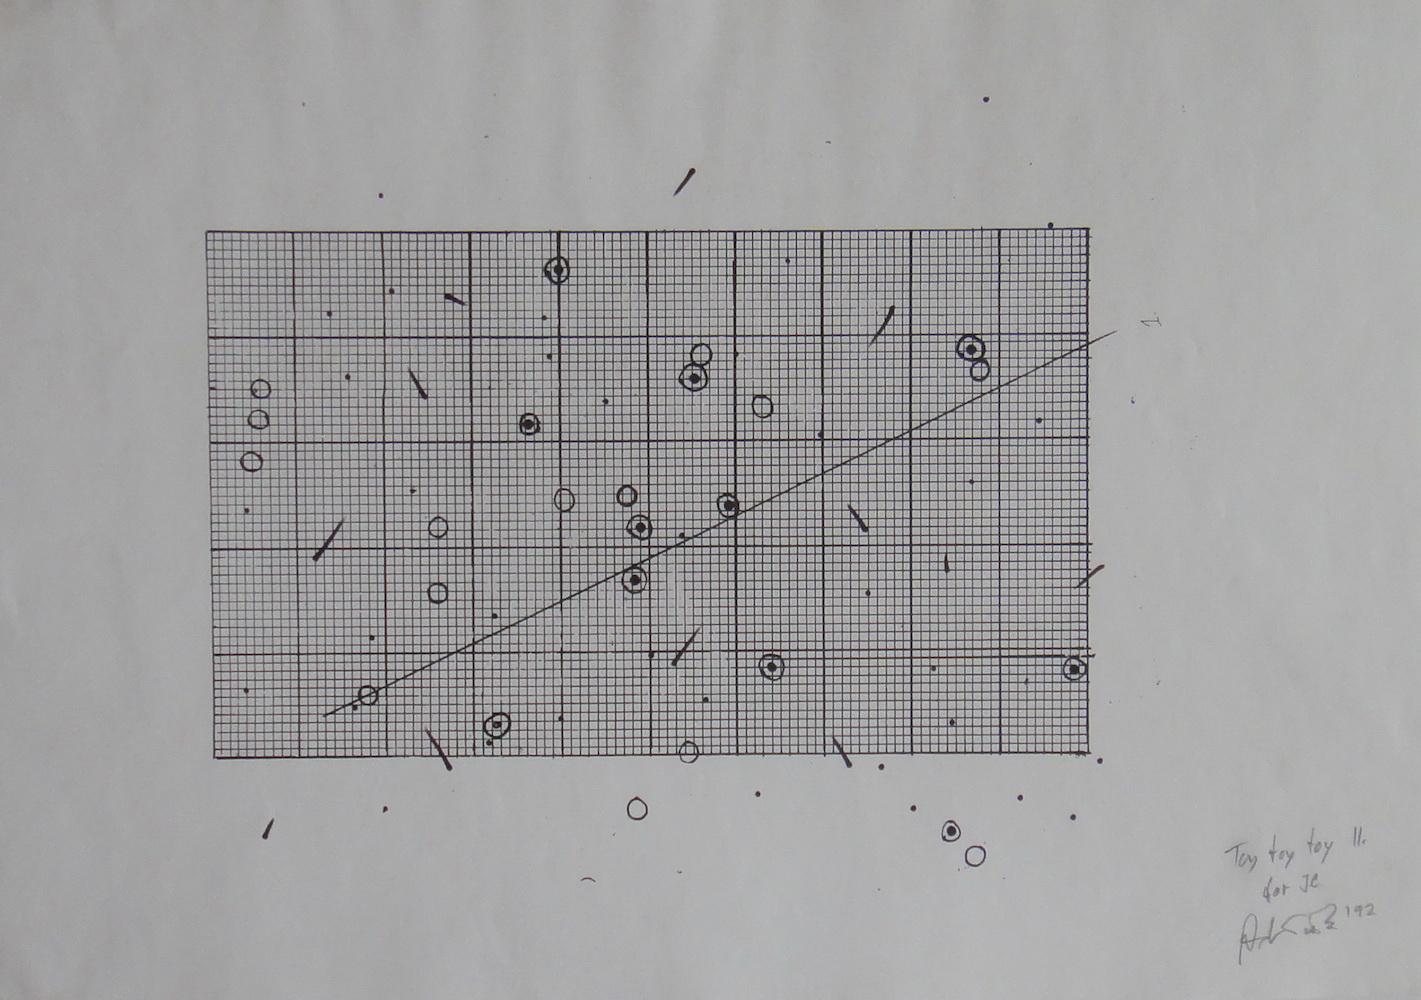 1992, Toy Toy II. for John Cage, kombinovaná tech, 42x29,5 cm